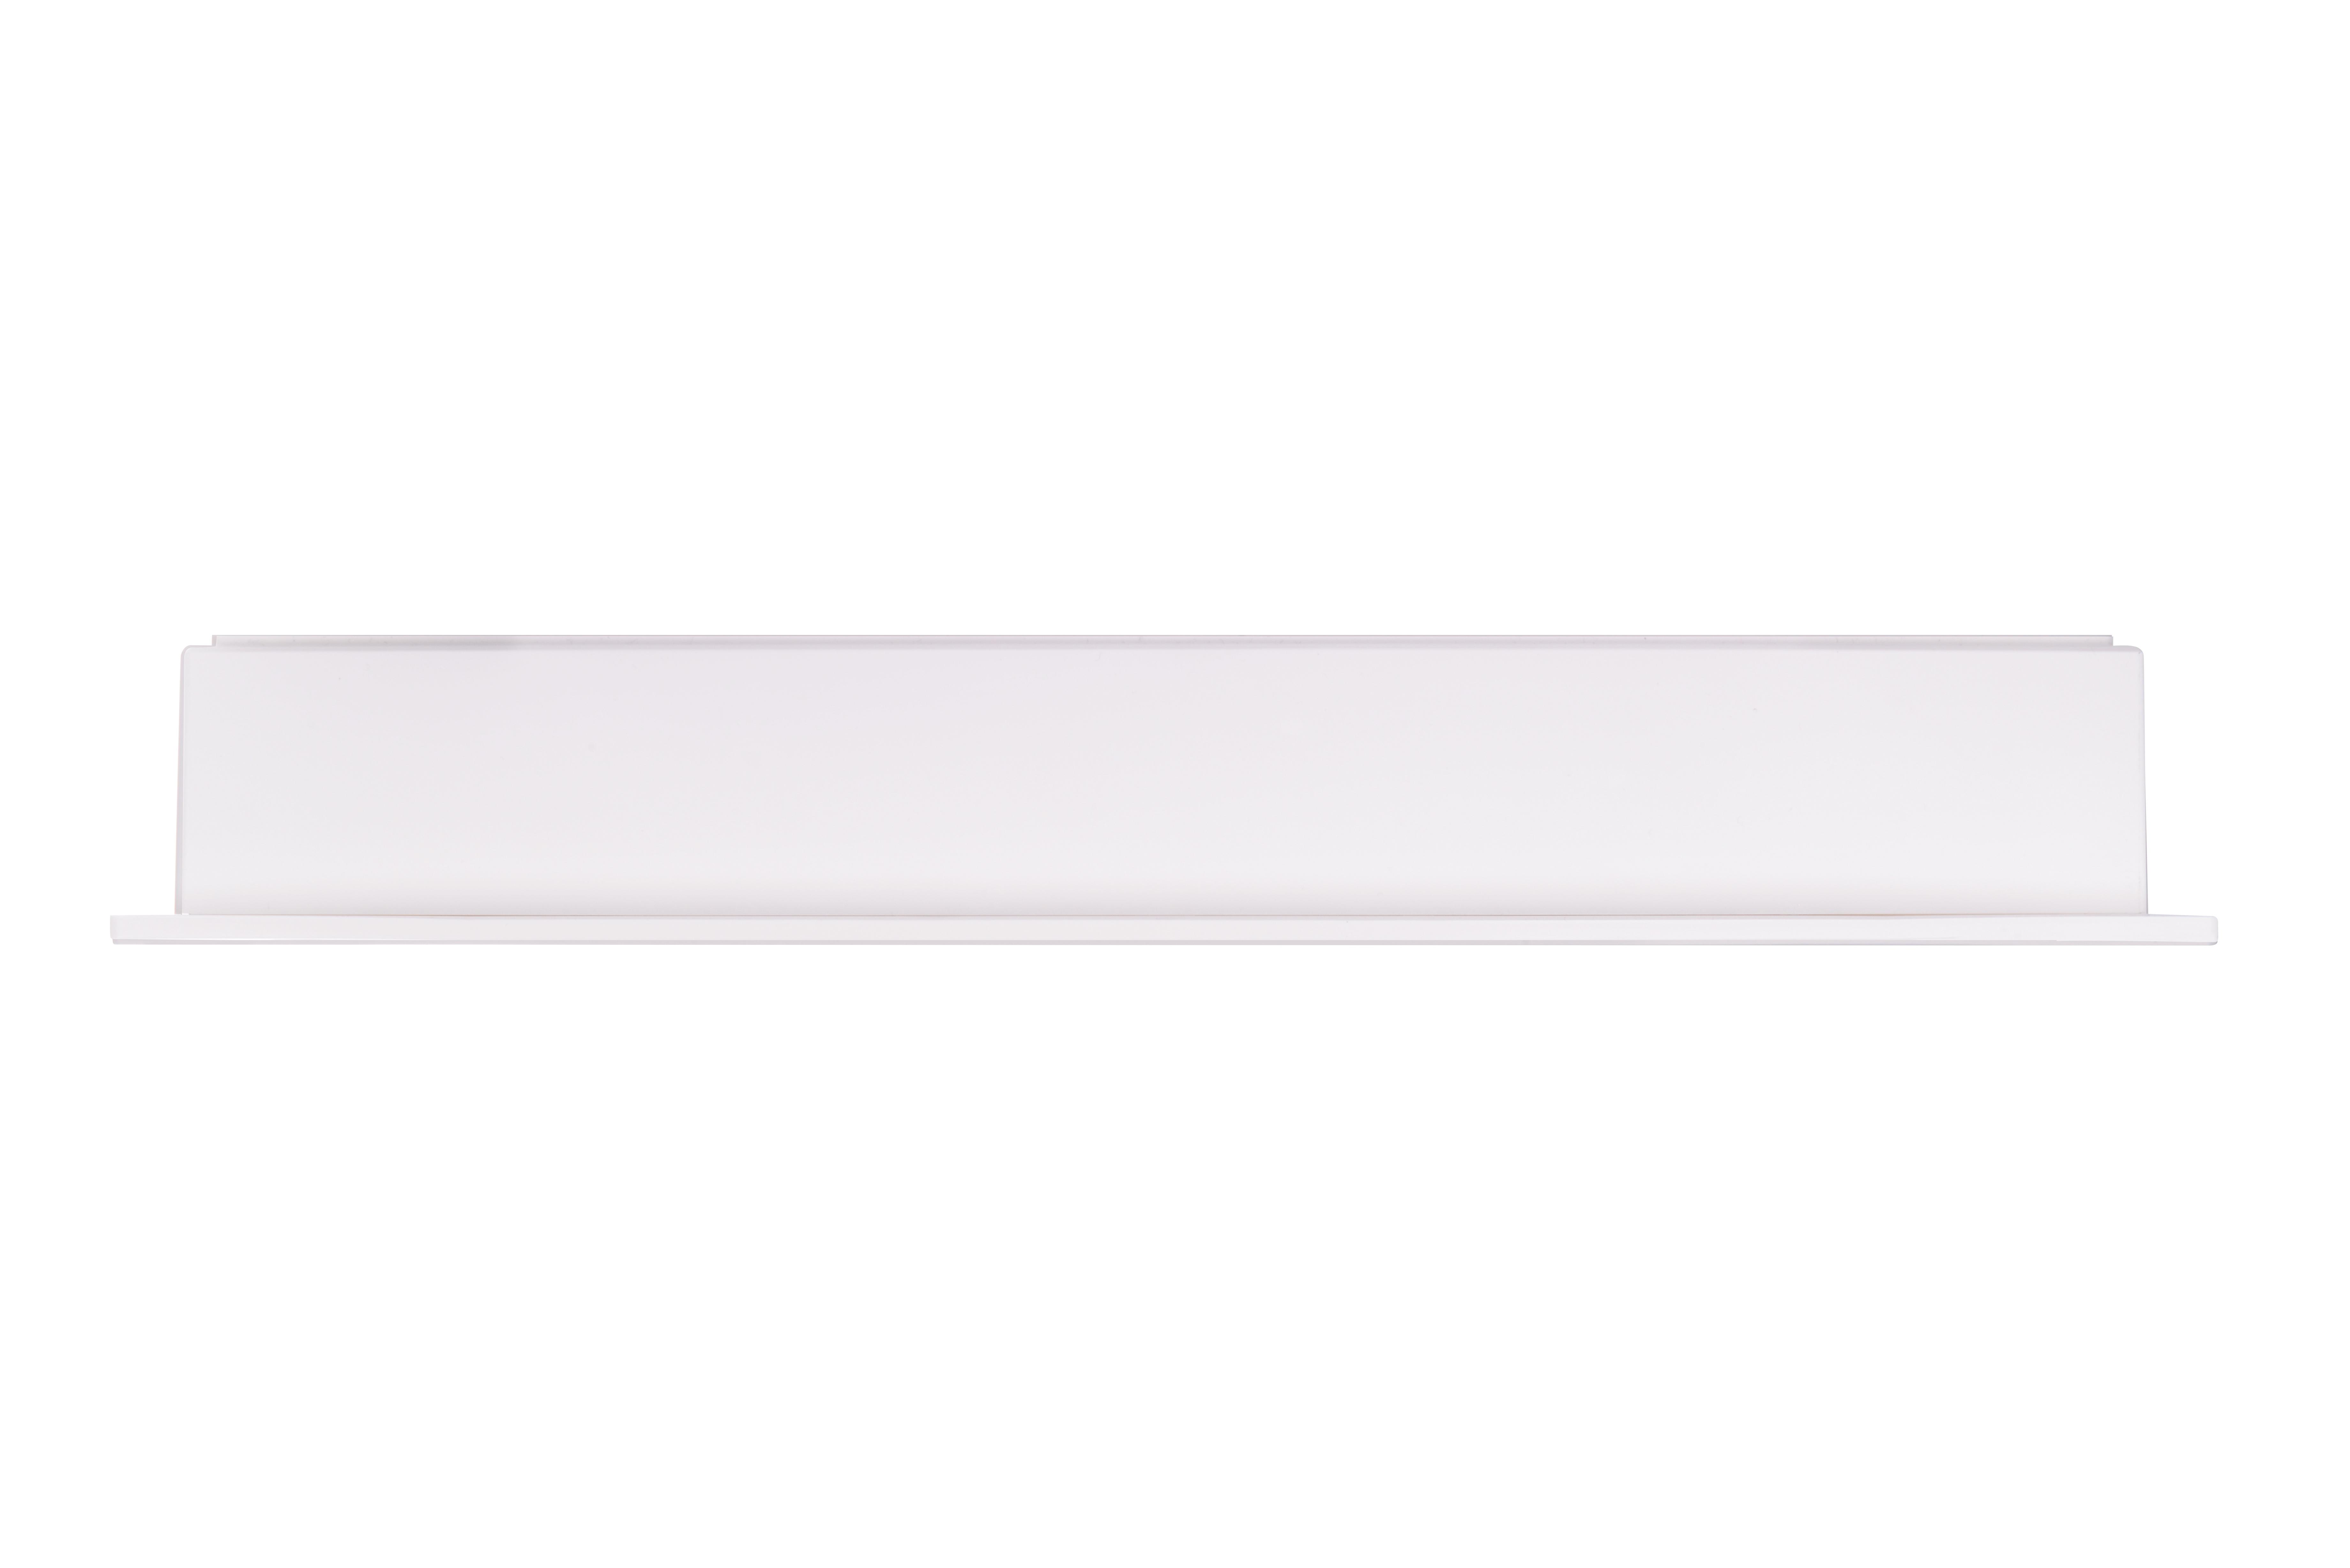 Lampa antipanica led Intelight 94717   3h nementinut test automat 5